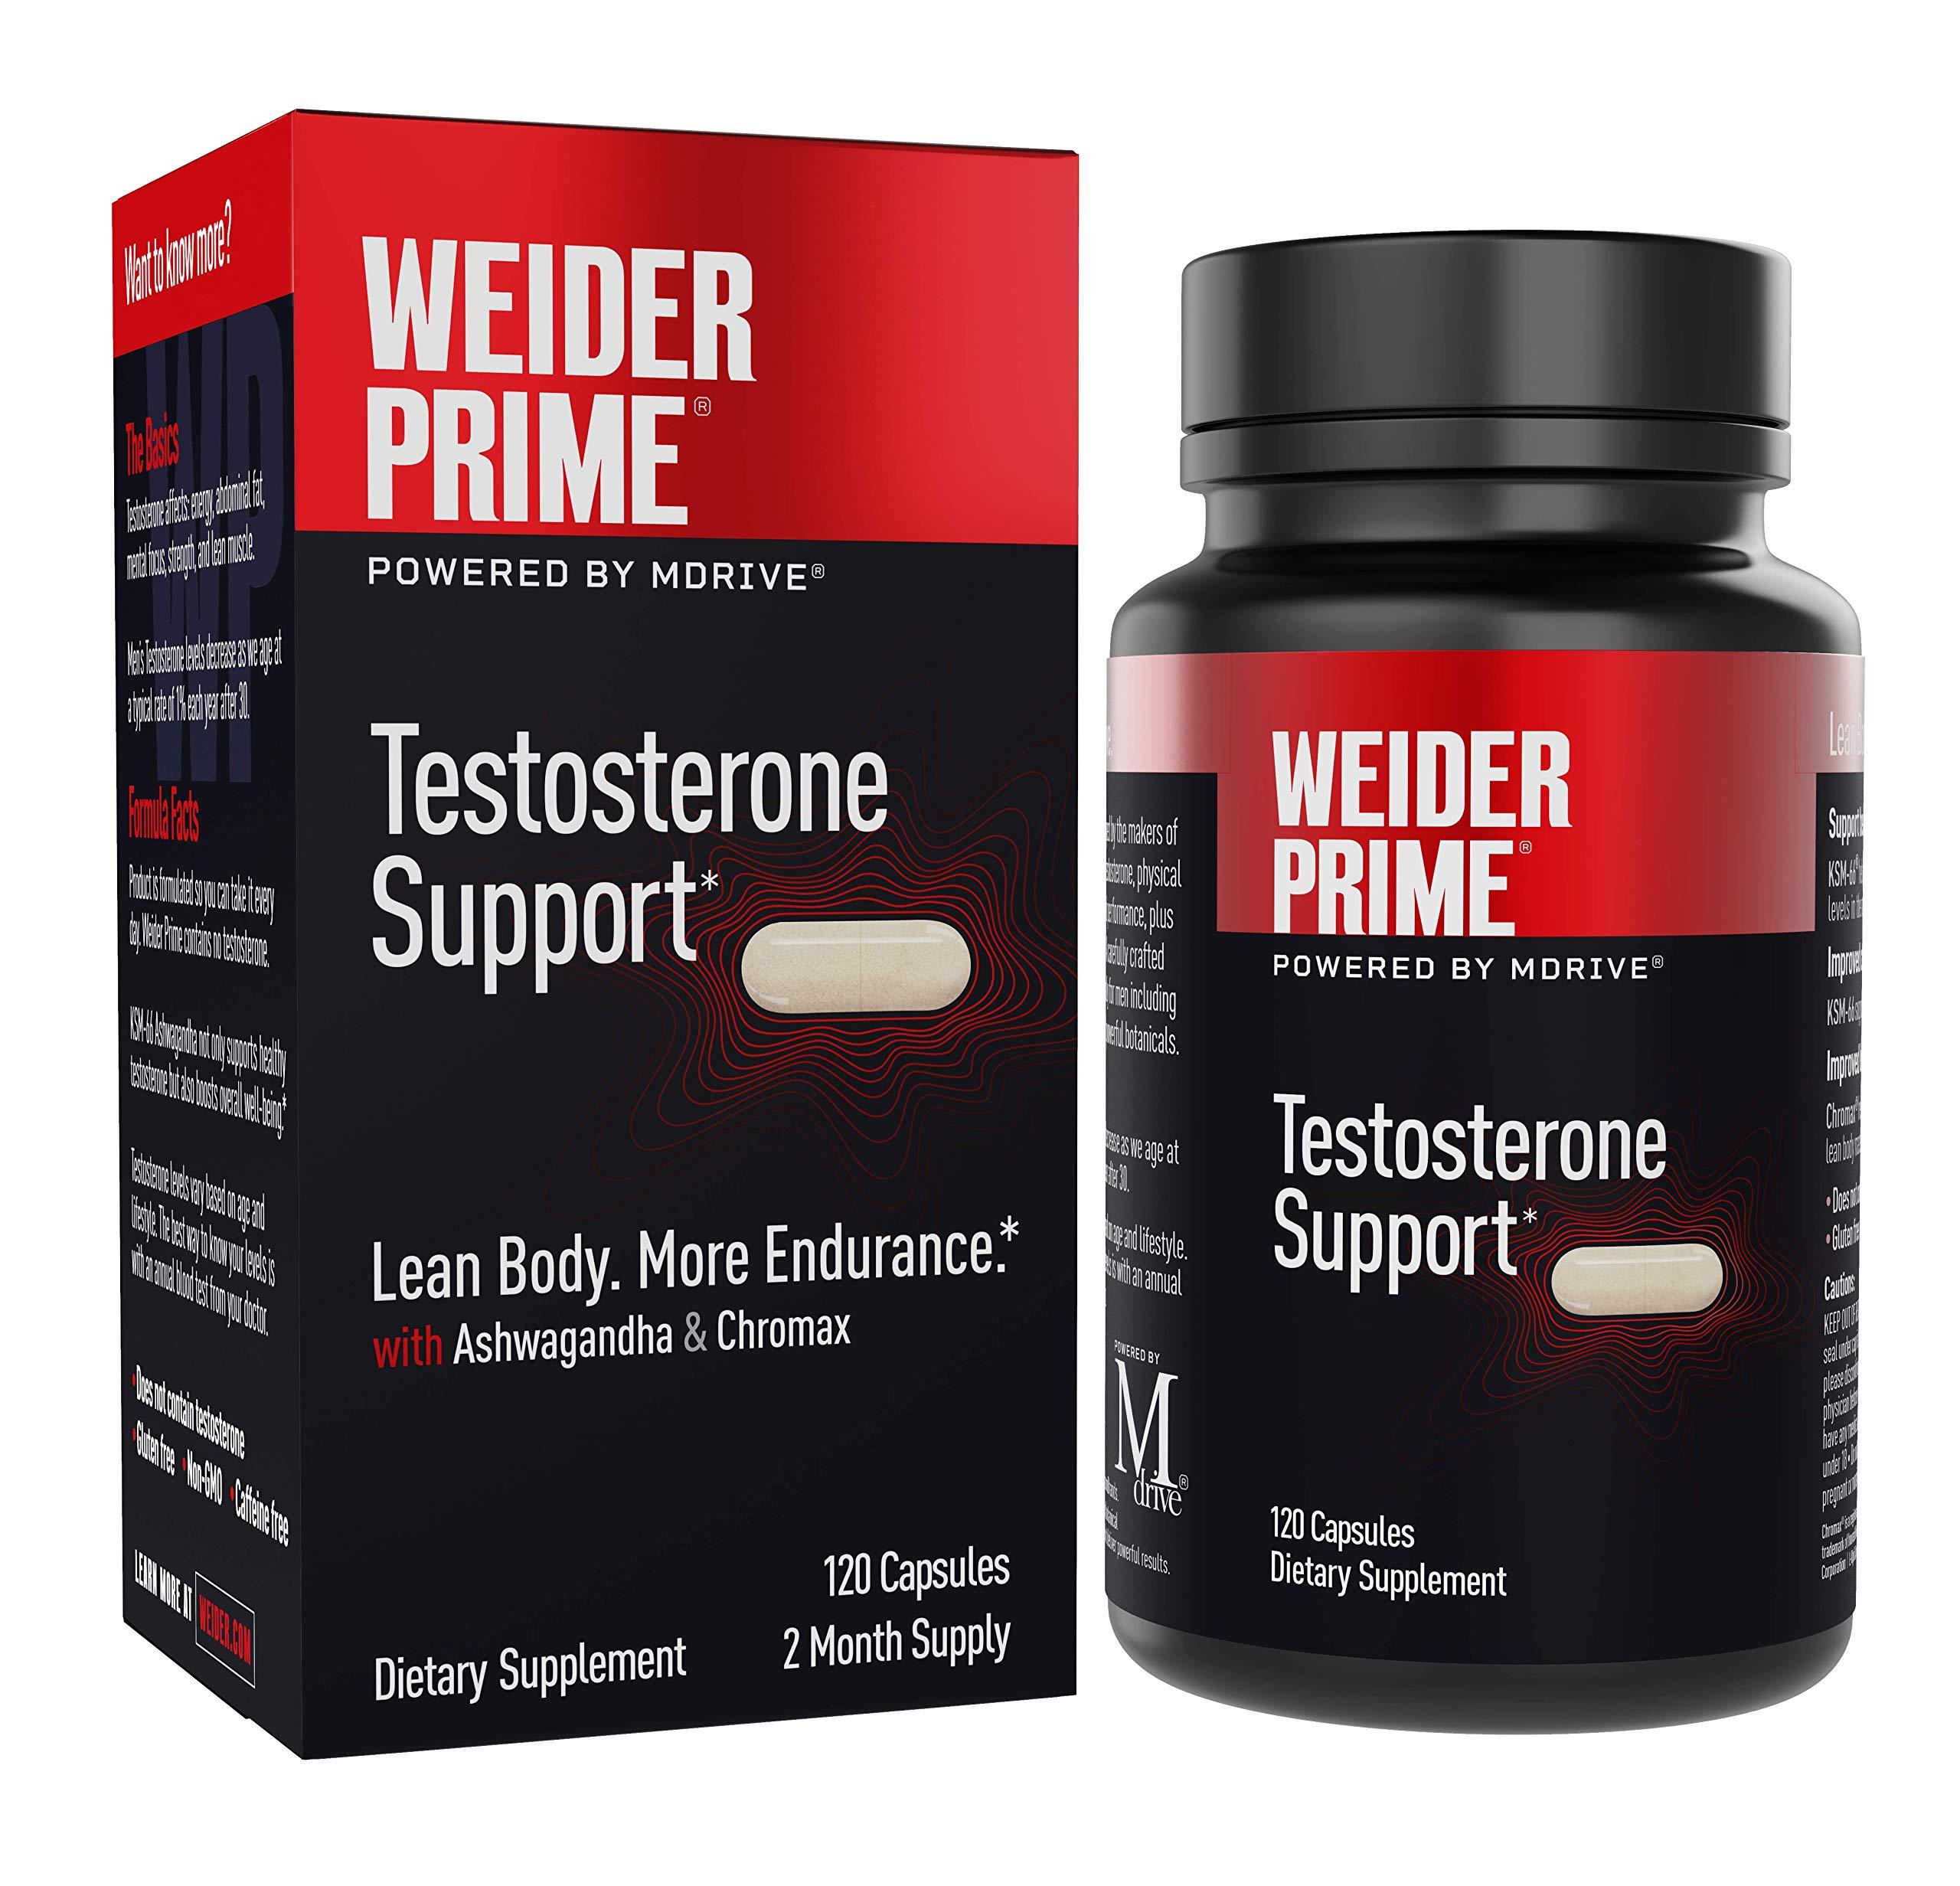 Weider Prime Testosterone Supplement for Men Healthy Testosterone Support to Help Boost